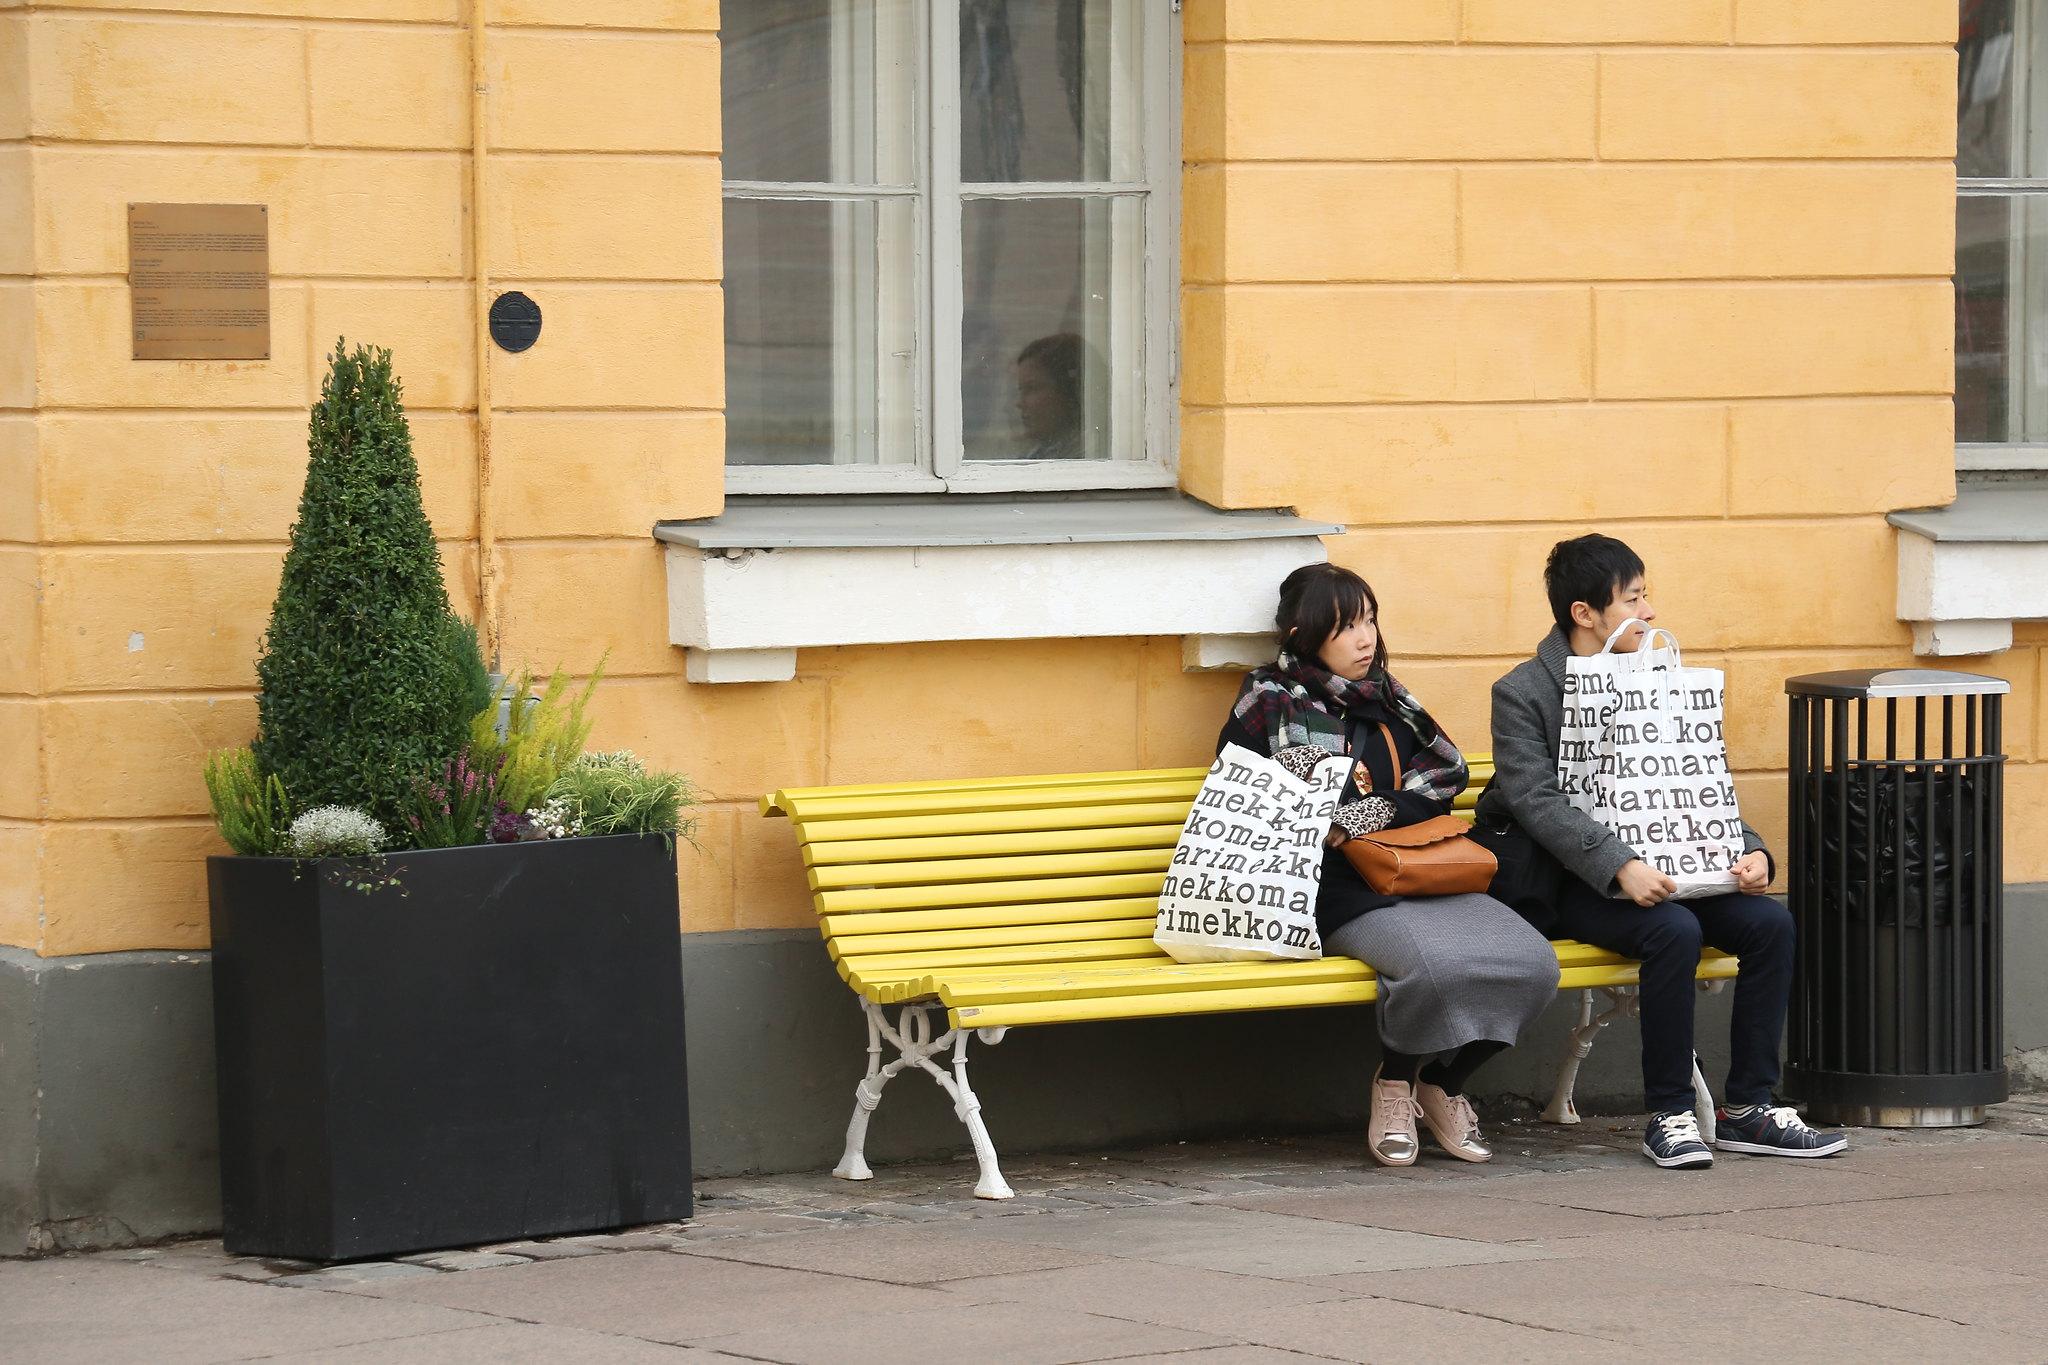 Helsinki_okt18_404